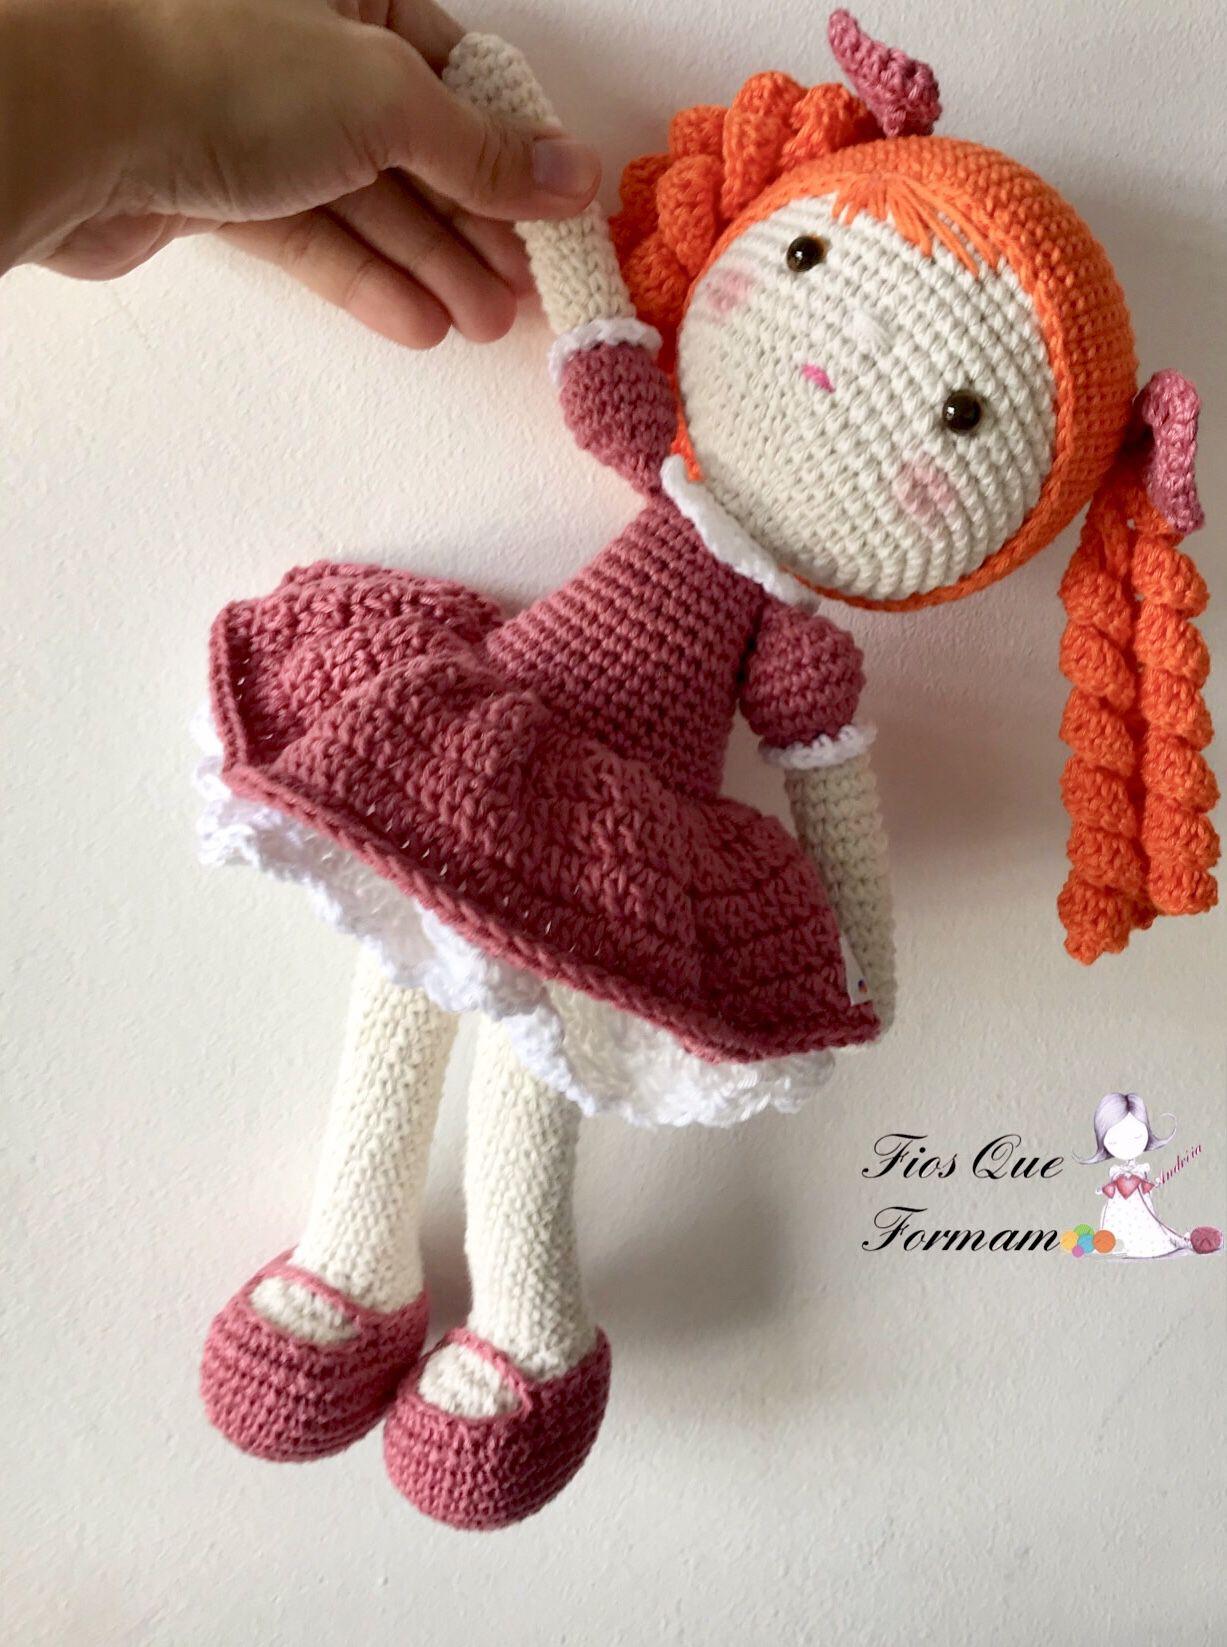 Boneca amigurumi/ boneca crochê no Elo7 | Novelo de ideias Ateliê ... | 1647x1227